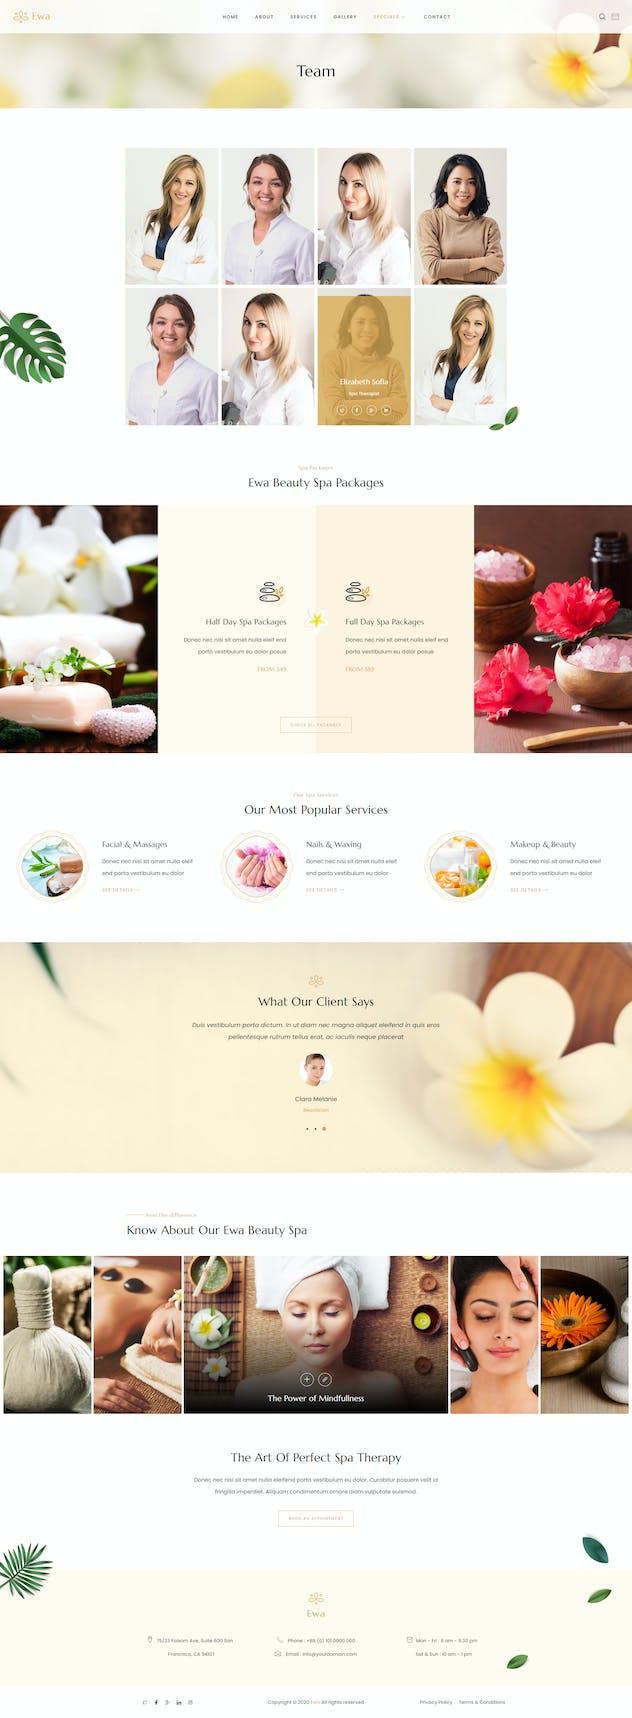 Ewa - Beauty & Spa Salon Elementor Template Kit - product preview 6